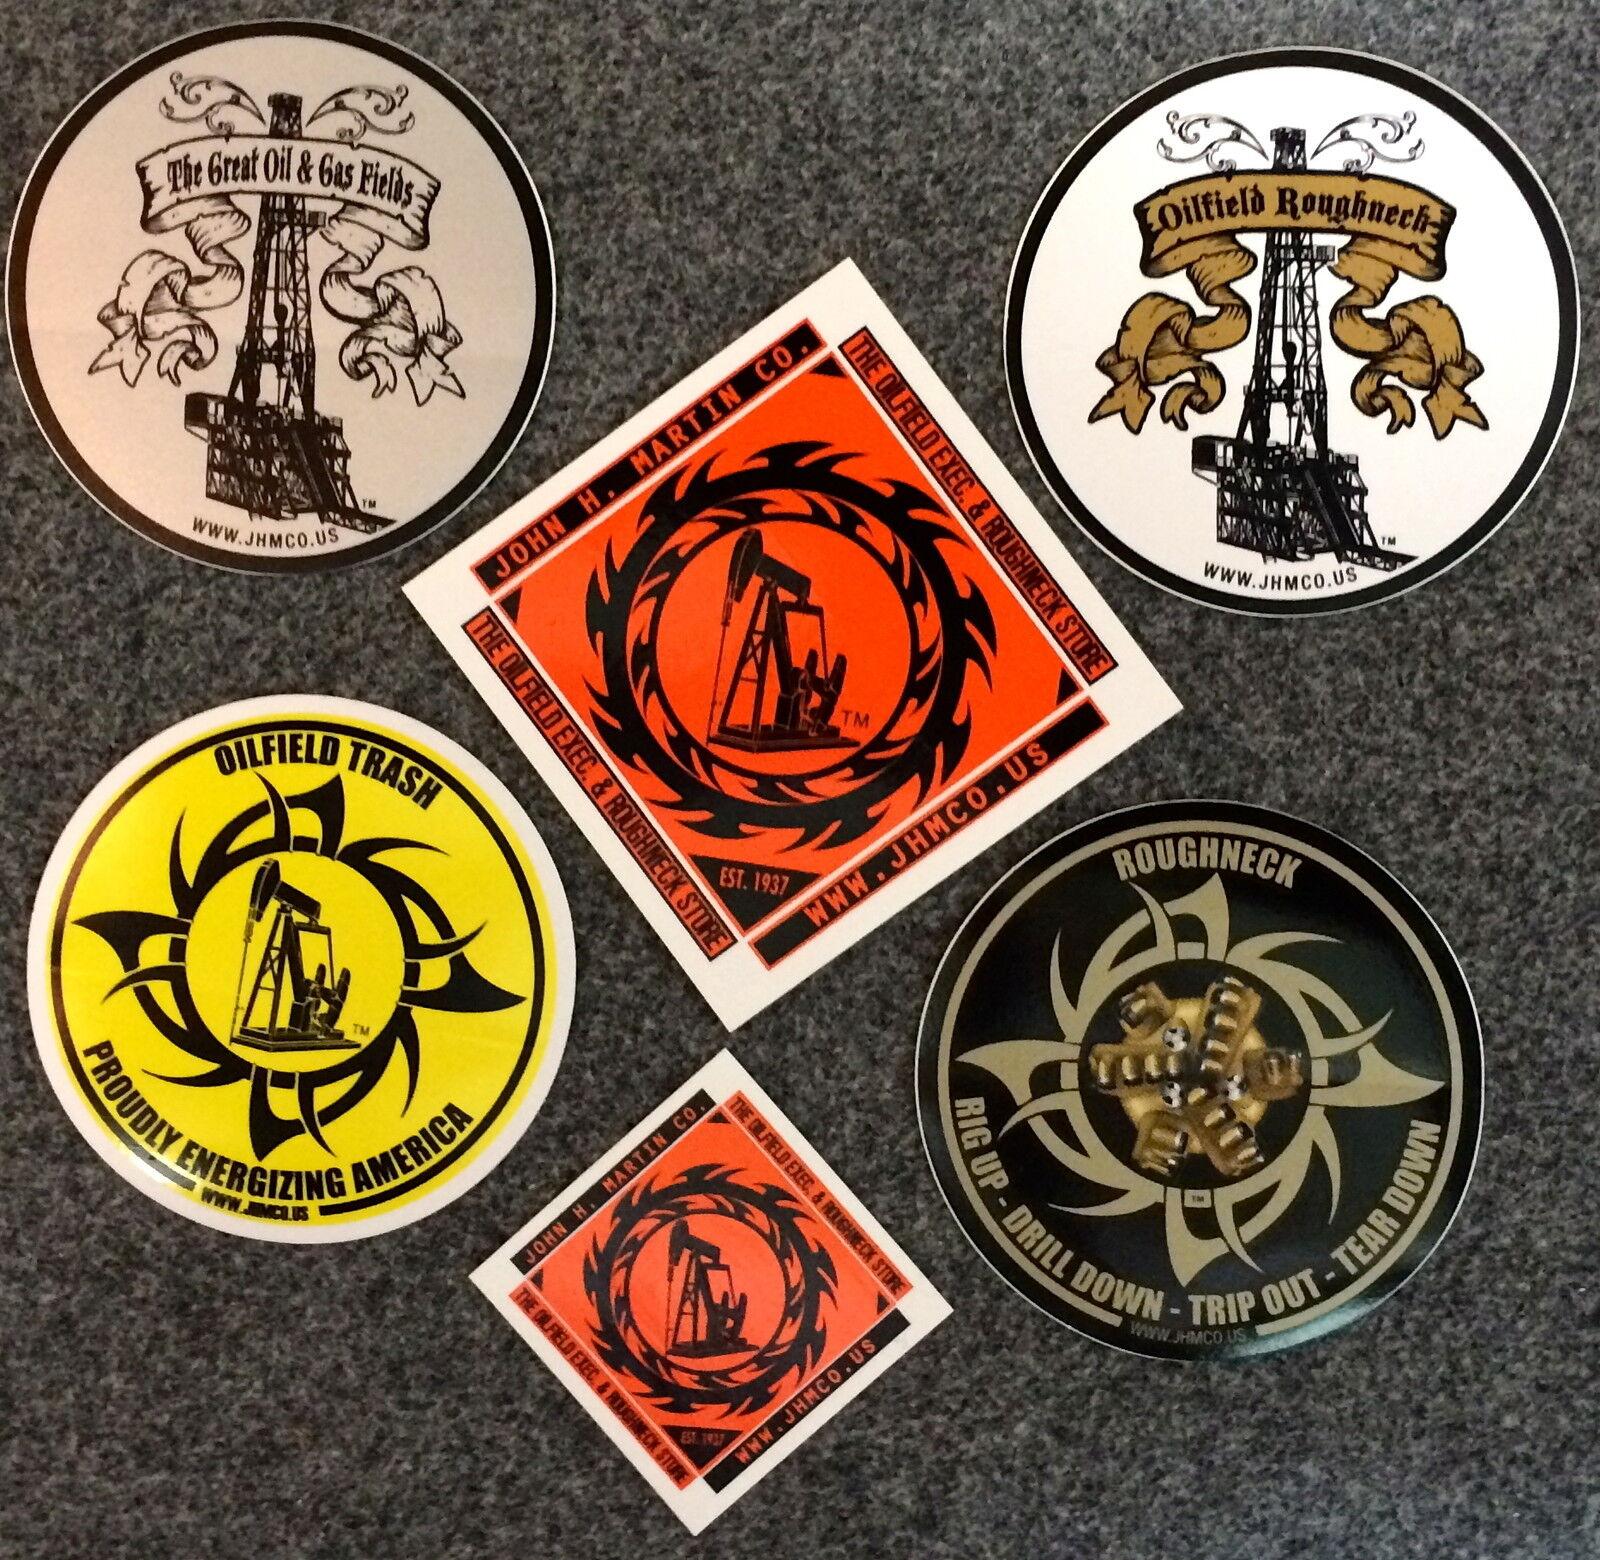 6 Oilfield Hardhat Stickers Roughneck Drilling Rig Oil Trash Decals Frac  Gas Bit